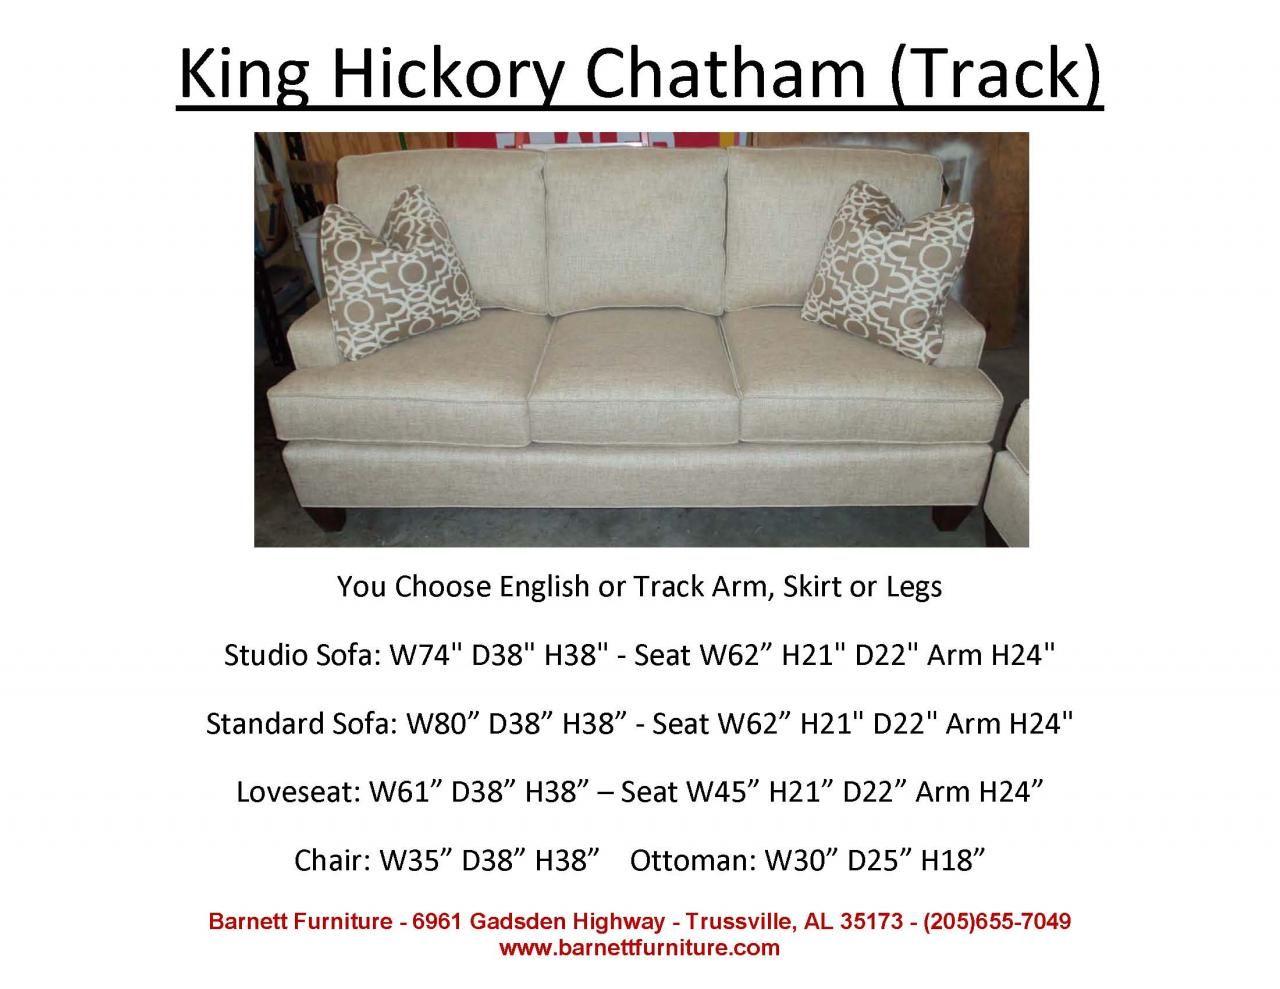 Pleasant King Hickory Chatham Sofa Track Arm Modern Leg You Inzonedesignstudio Interior Chair Design Inzonedesignstudiocom